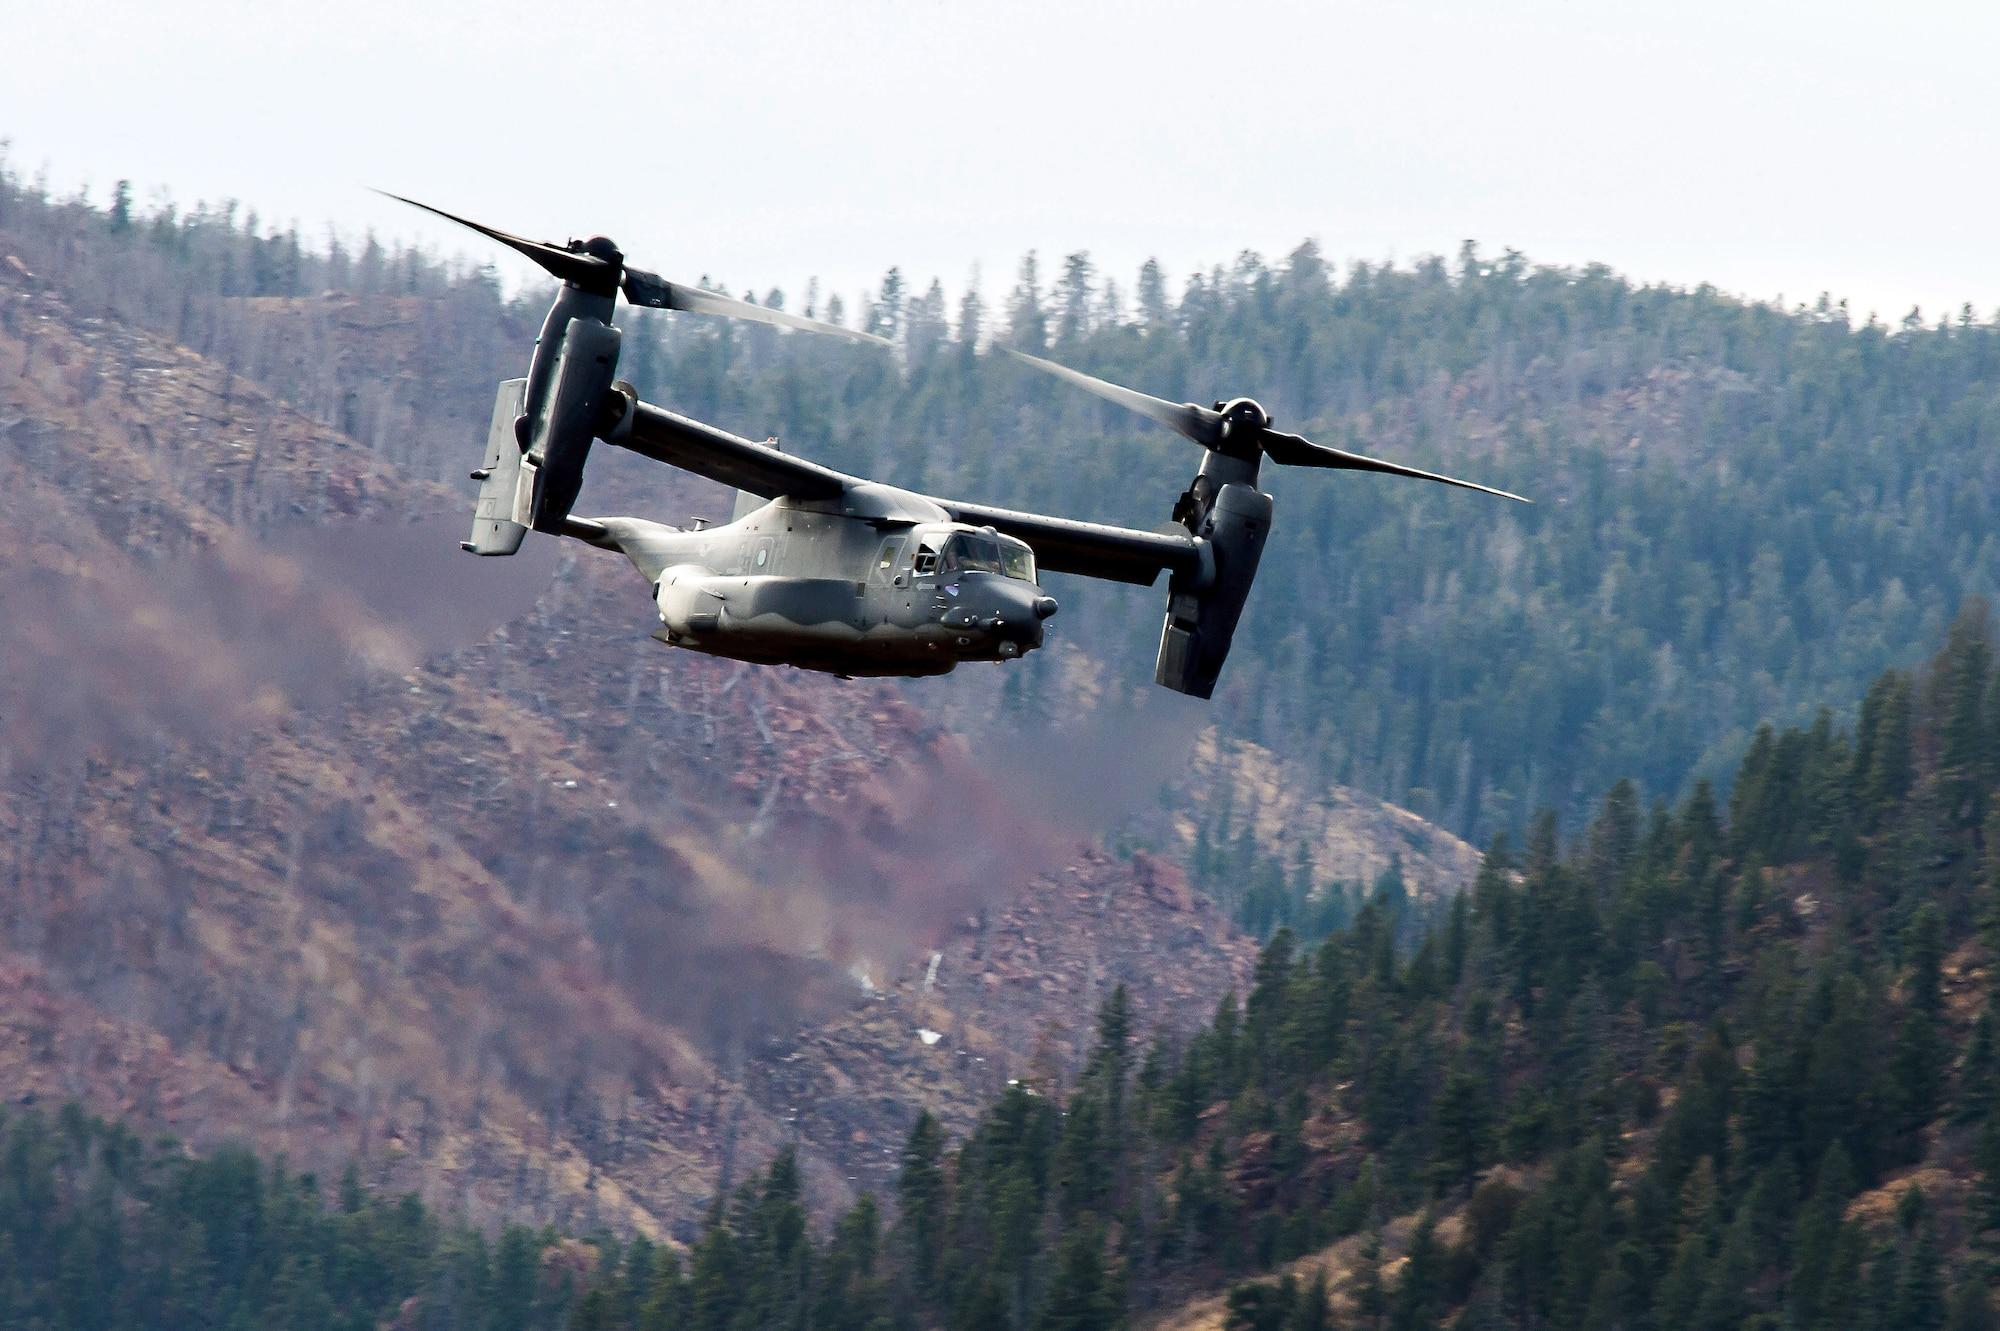 A CV-22 Osprey from Kirtland Air Force Base flies over the U.S. Air Force Academy